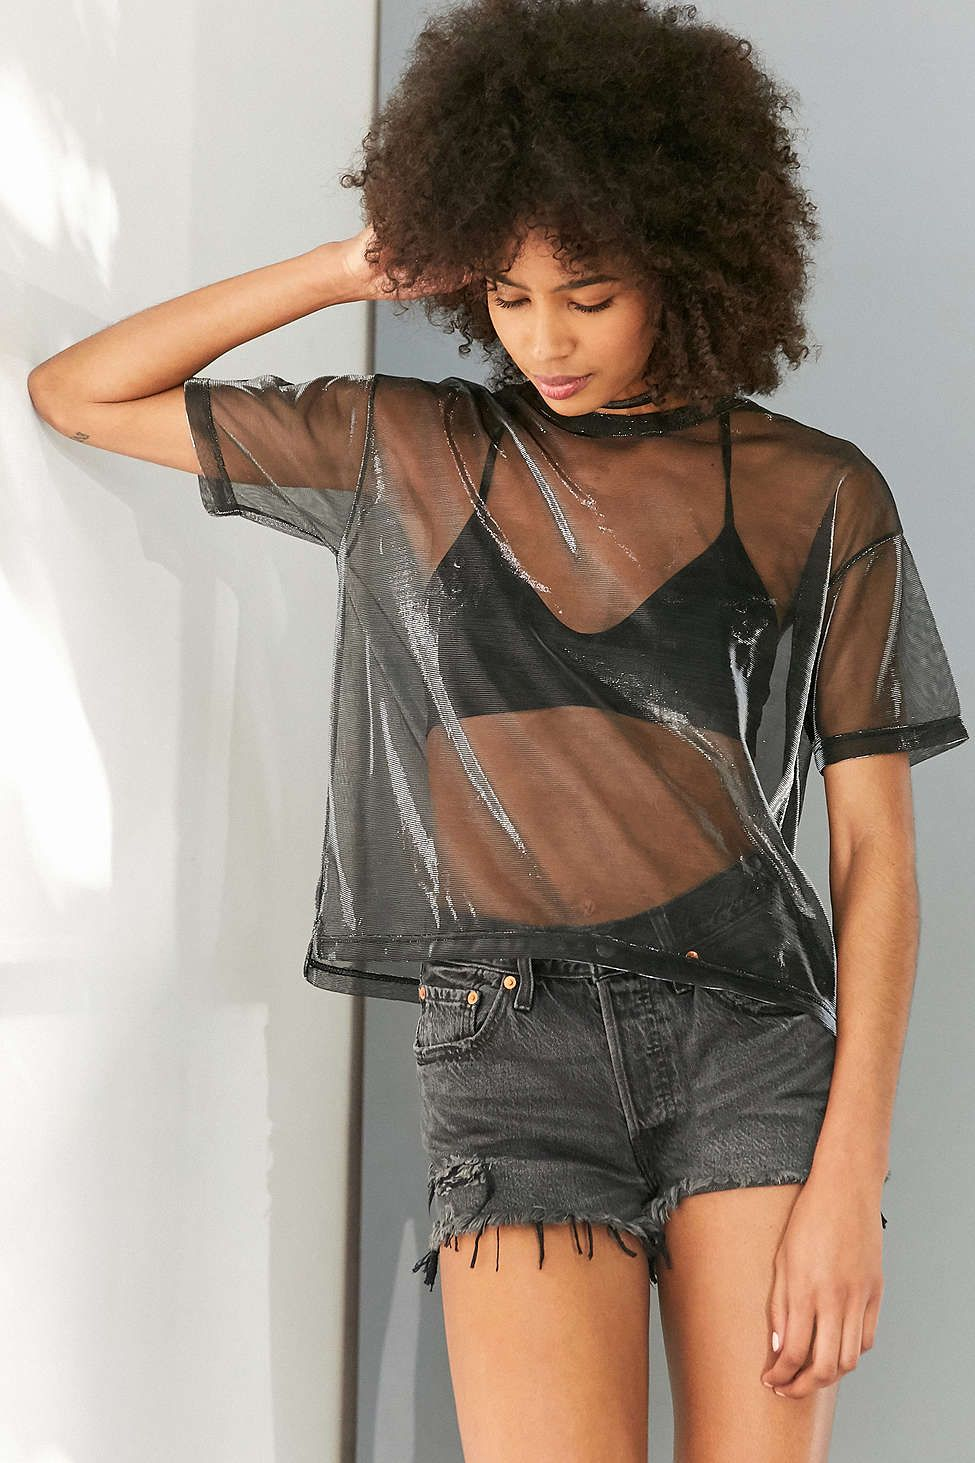 Levis 501 Frayed Denim Short Washed Black Urban Outfitters Moda Urbana Moda Gitana Moda Para Mujer